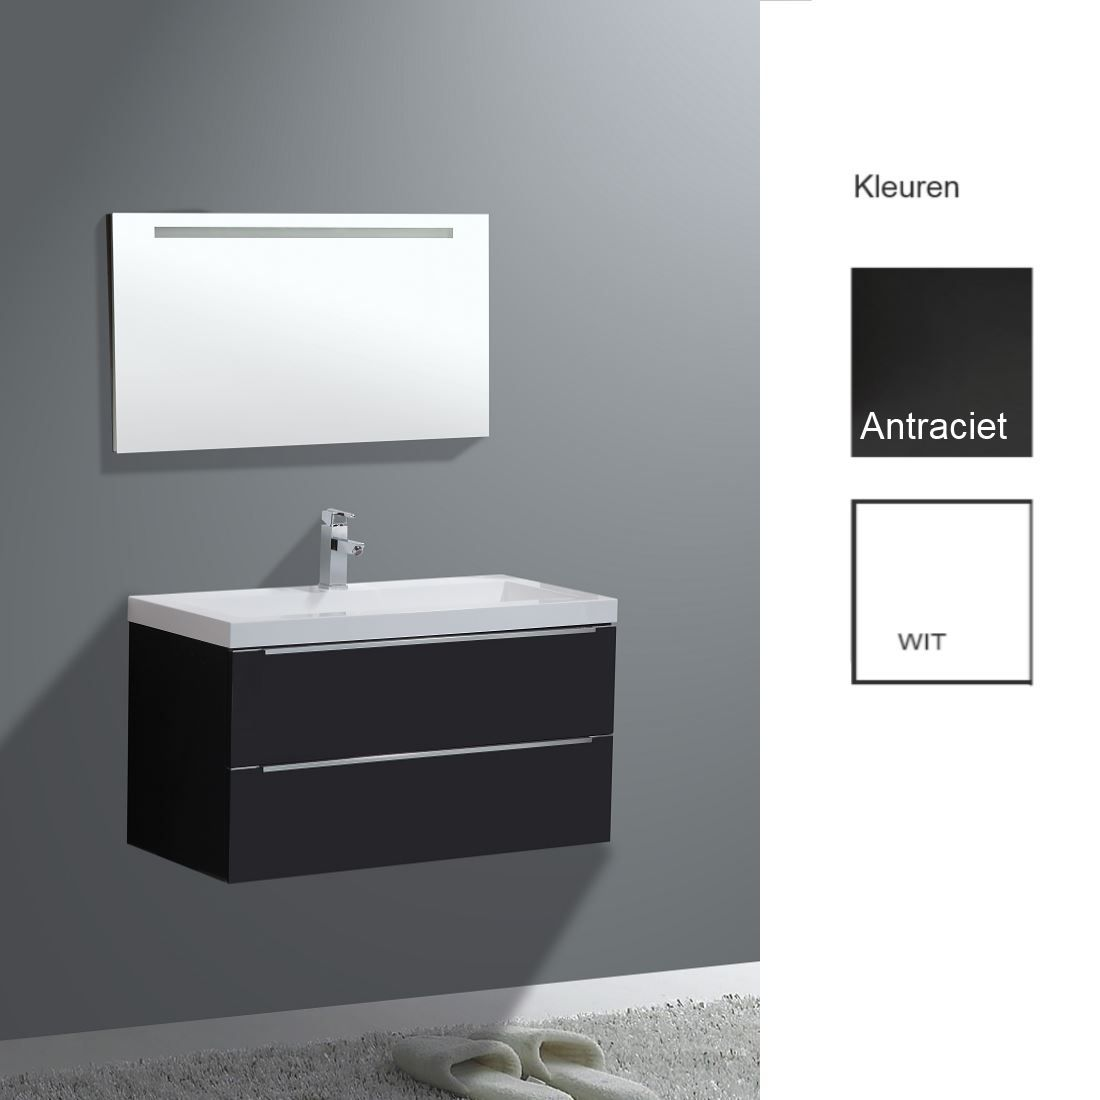 Badkamermeubels Wastafelonderkast kopen? Badkamermeubelset Sanilux Senza 100x47x50 cm (in twee kleuren leverbaar) met korting